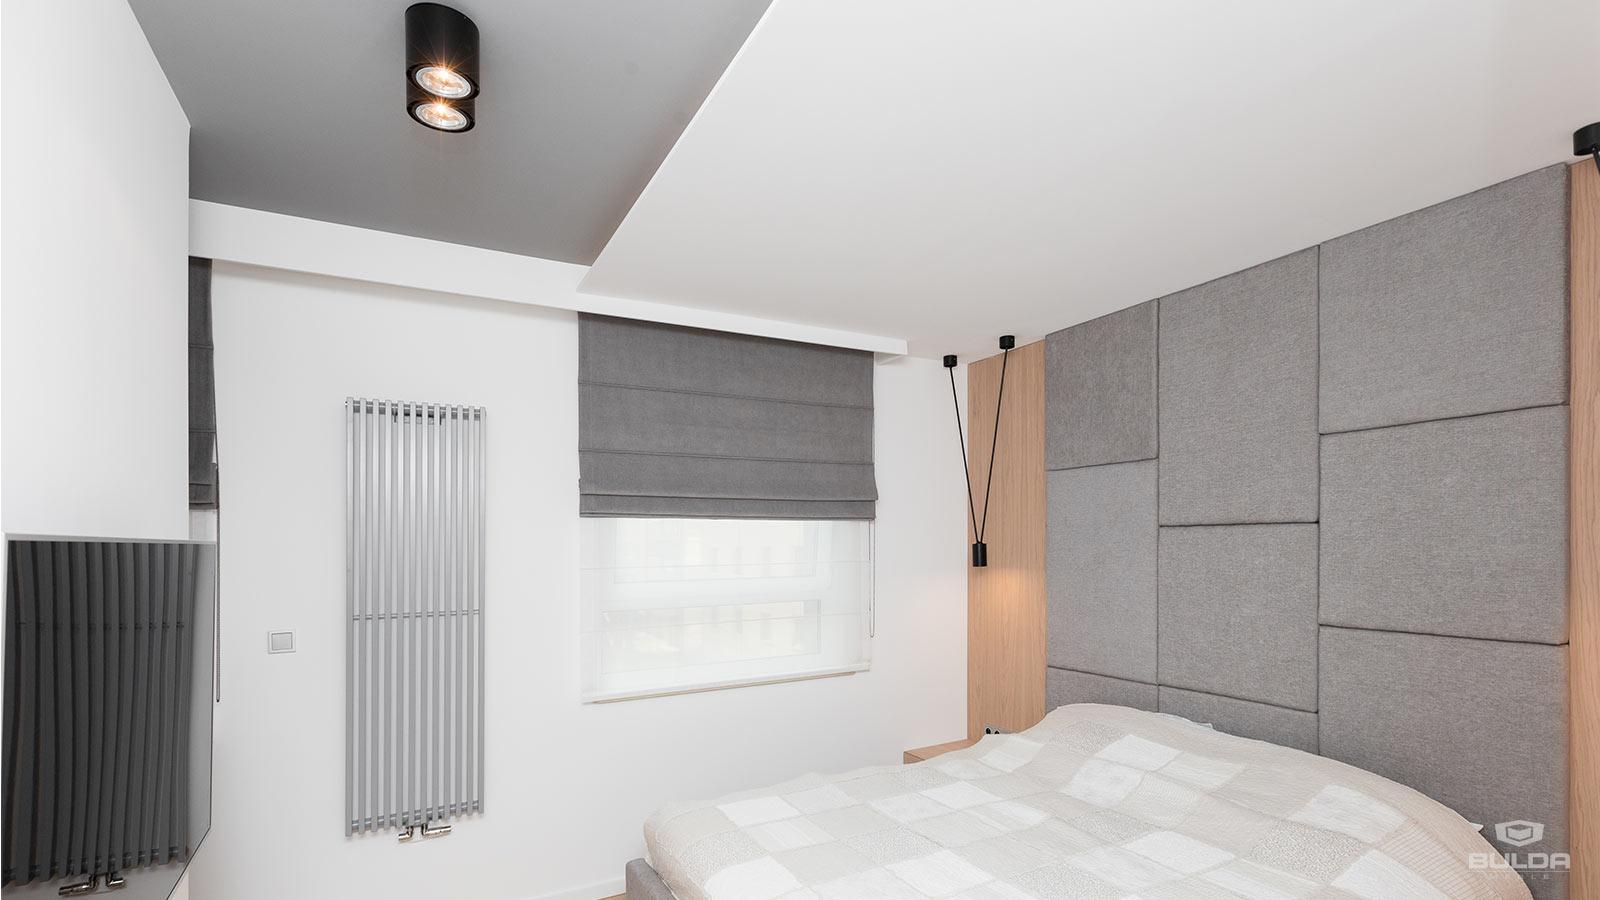 Reduta - apartament w Krakowie